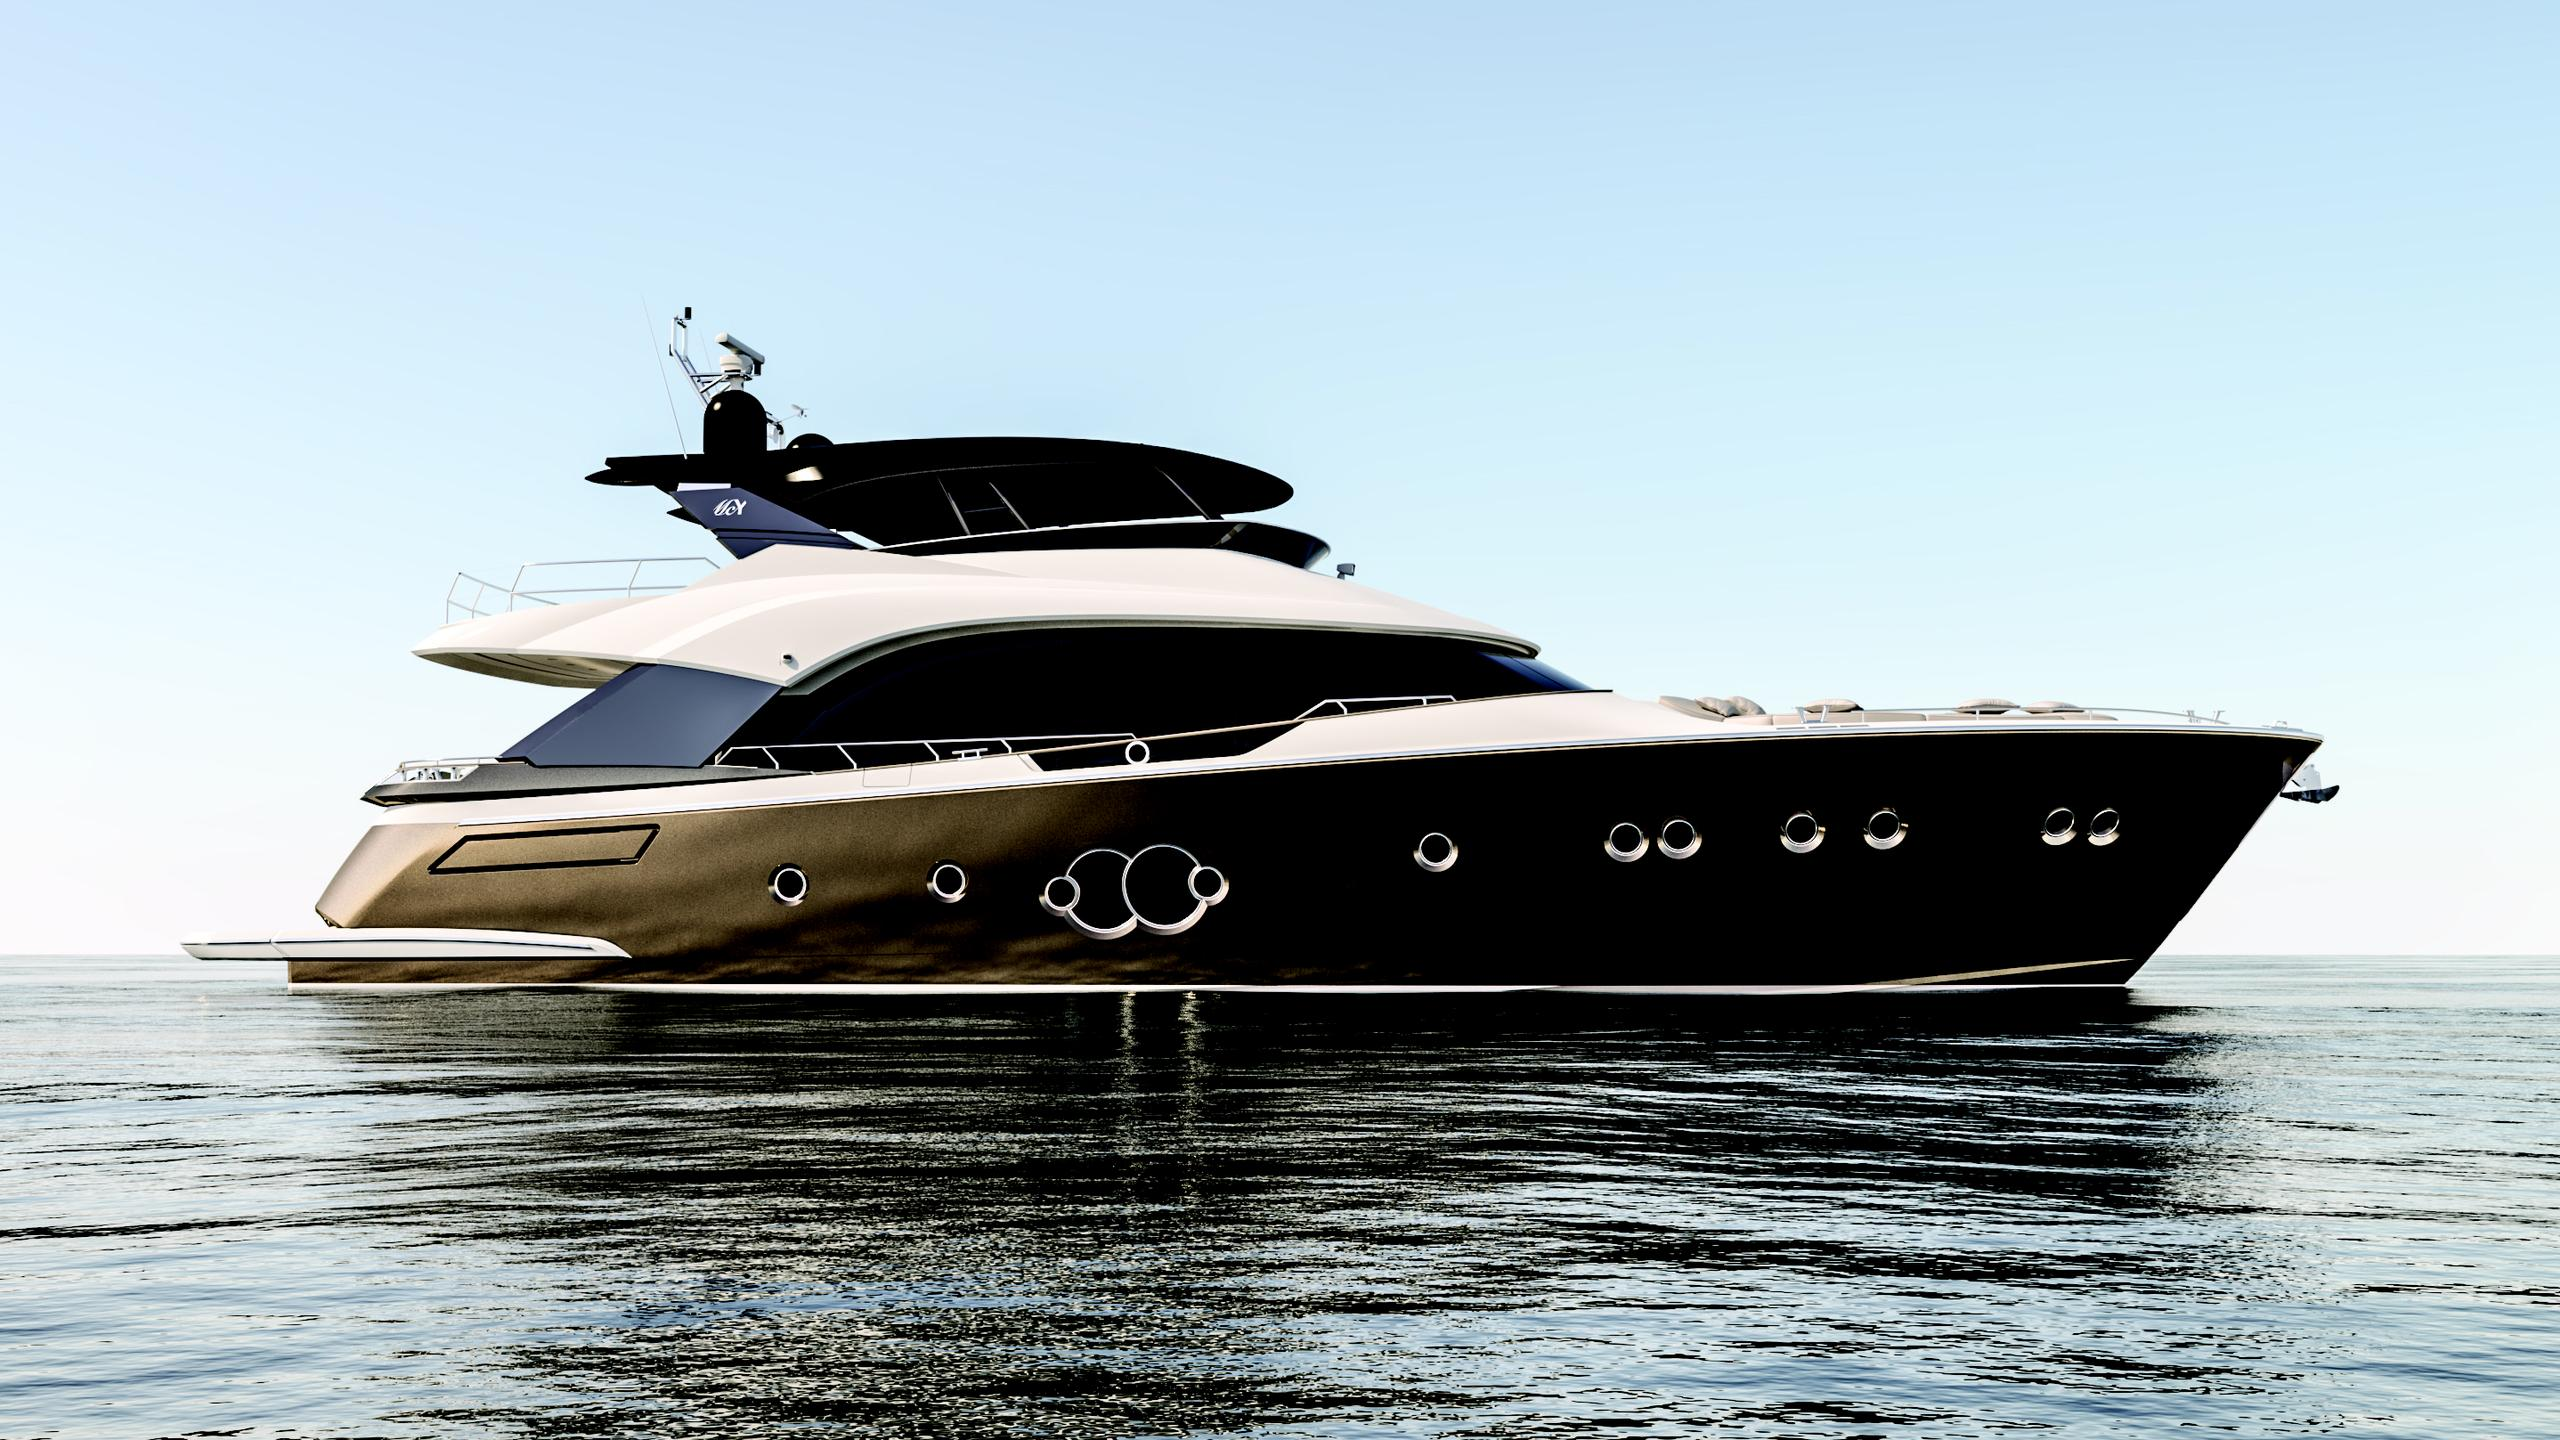 mcy 80 motoryacht monte carlo yachts 2016 24m profile rendering